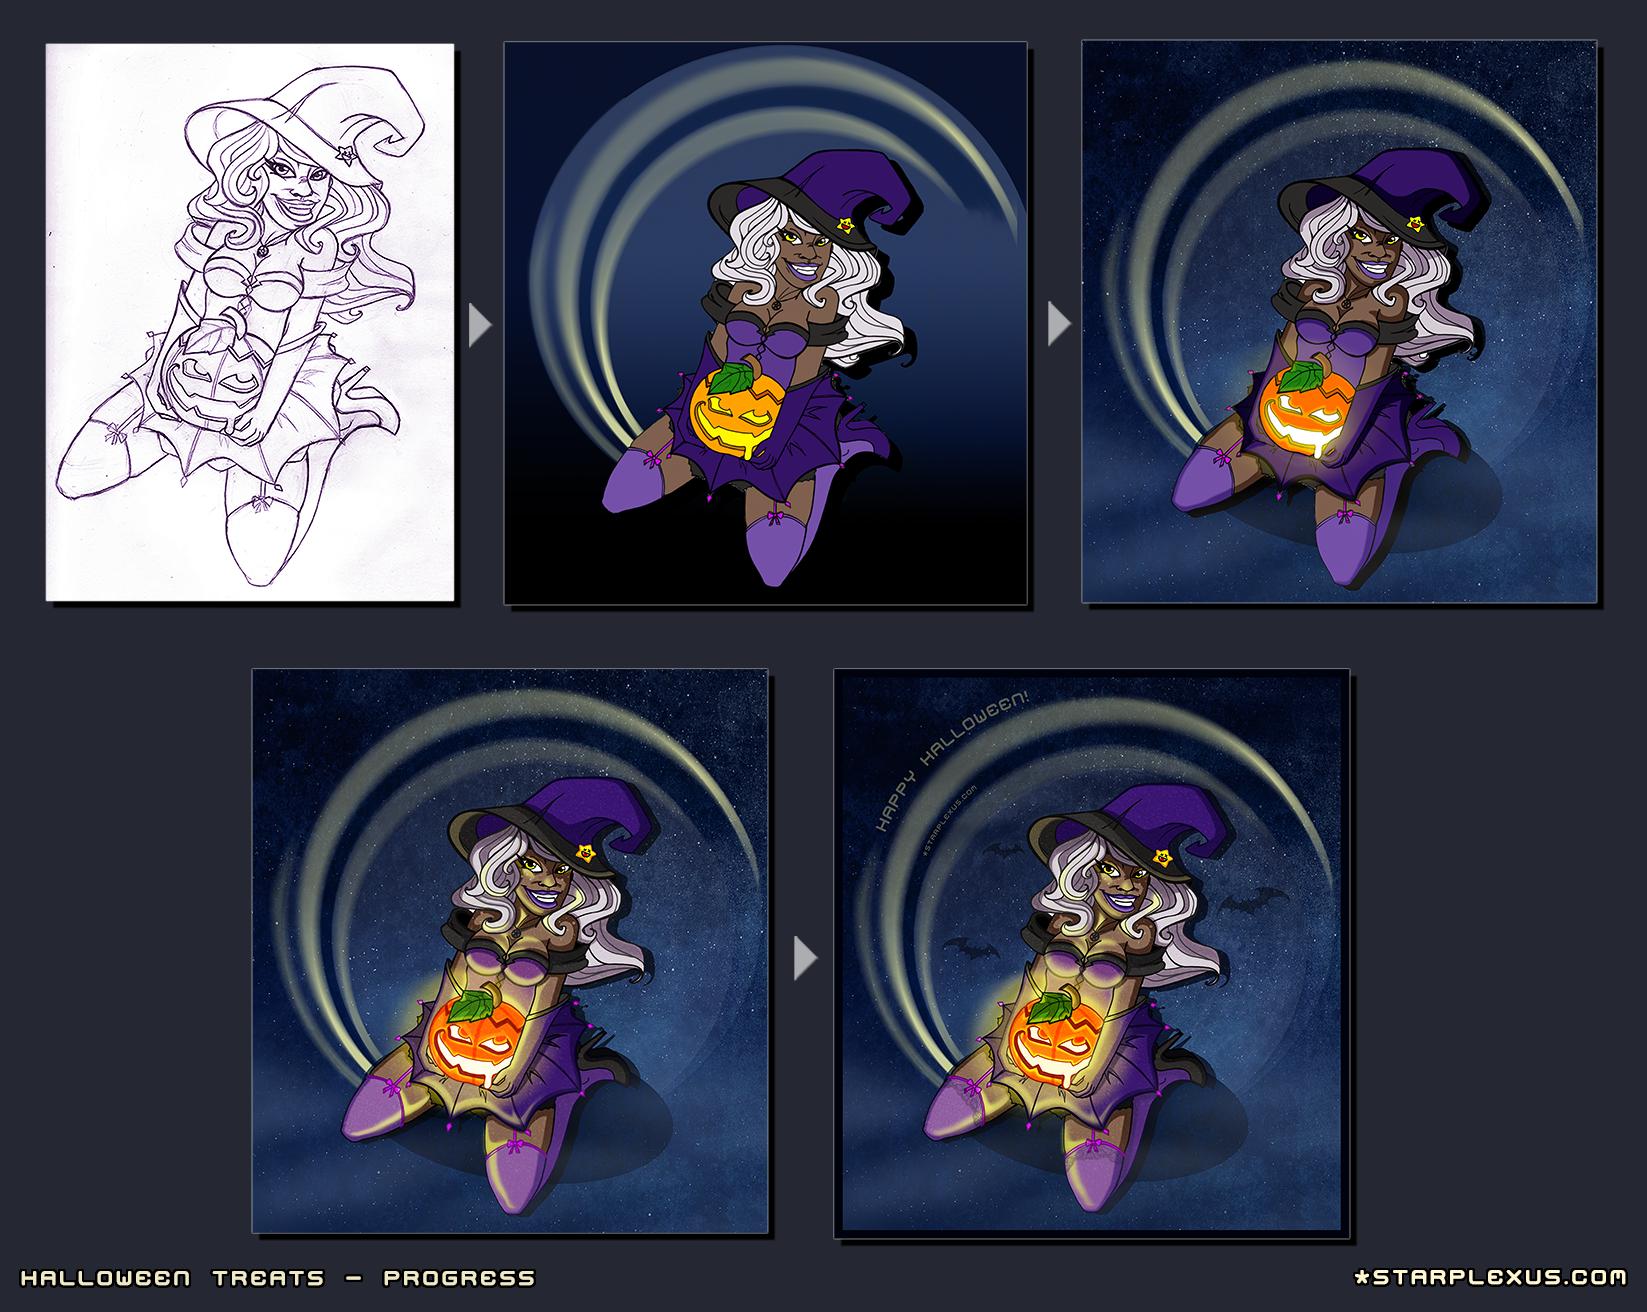 Halloween Treats Progress by starplexus